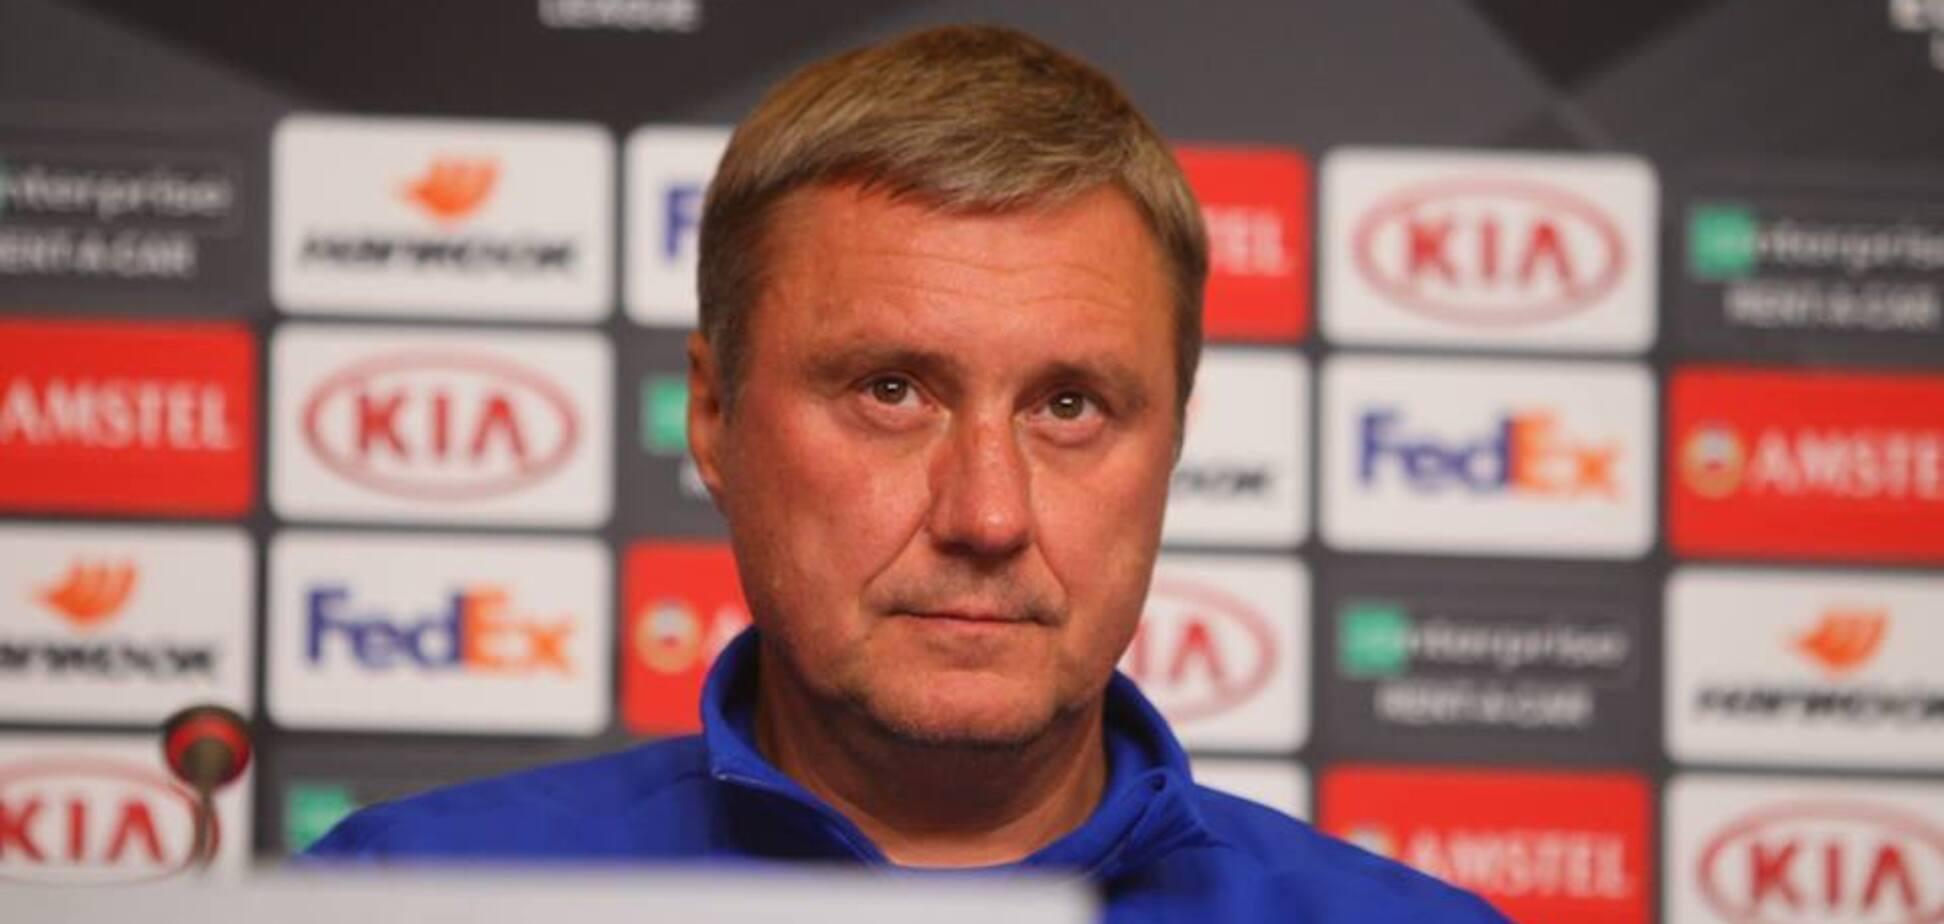 Хацкевич осадил СМИ после вылета из ЛЕ